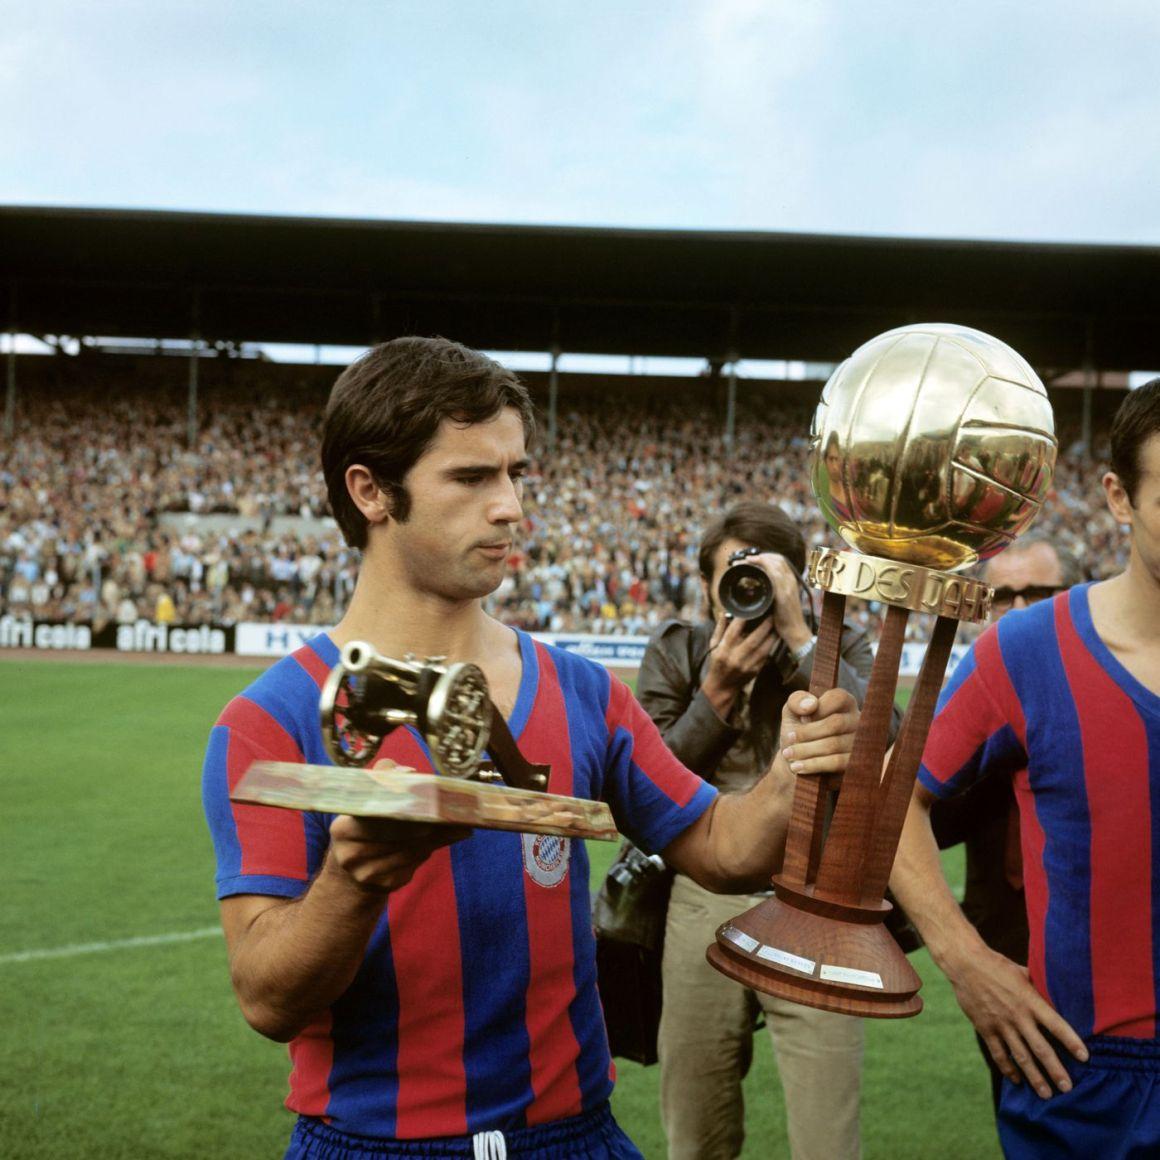 Hansi Flick says he thinks Gerd Müller is the greatest footballer of all time. - Bavarian Football Works